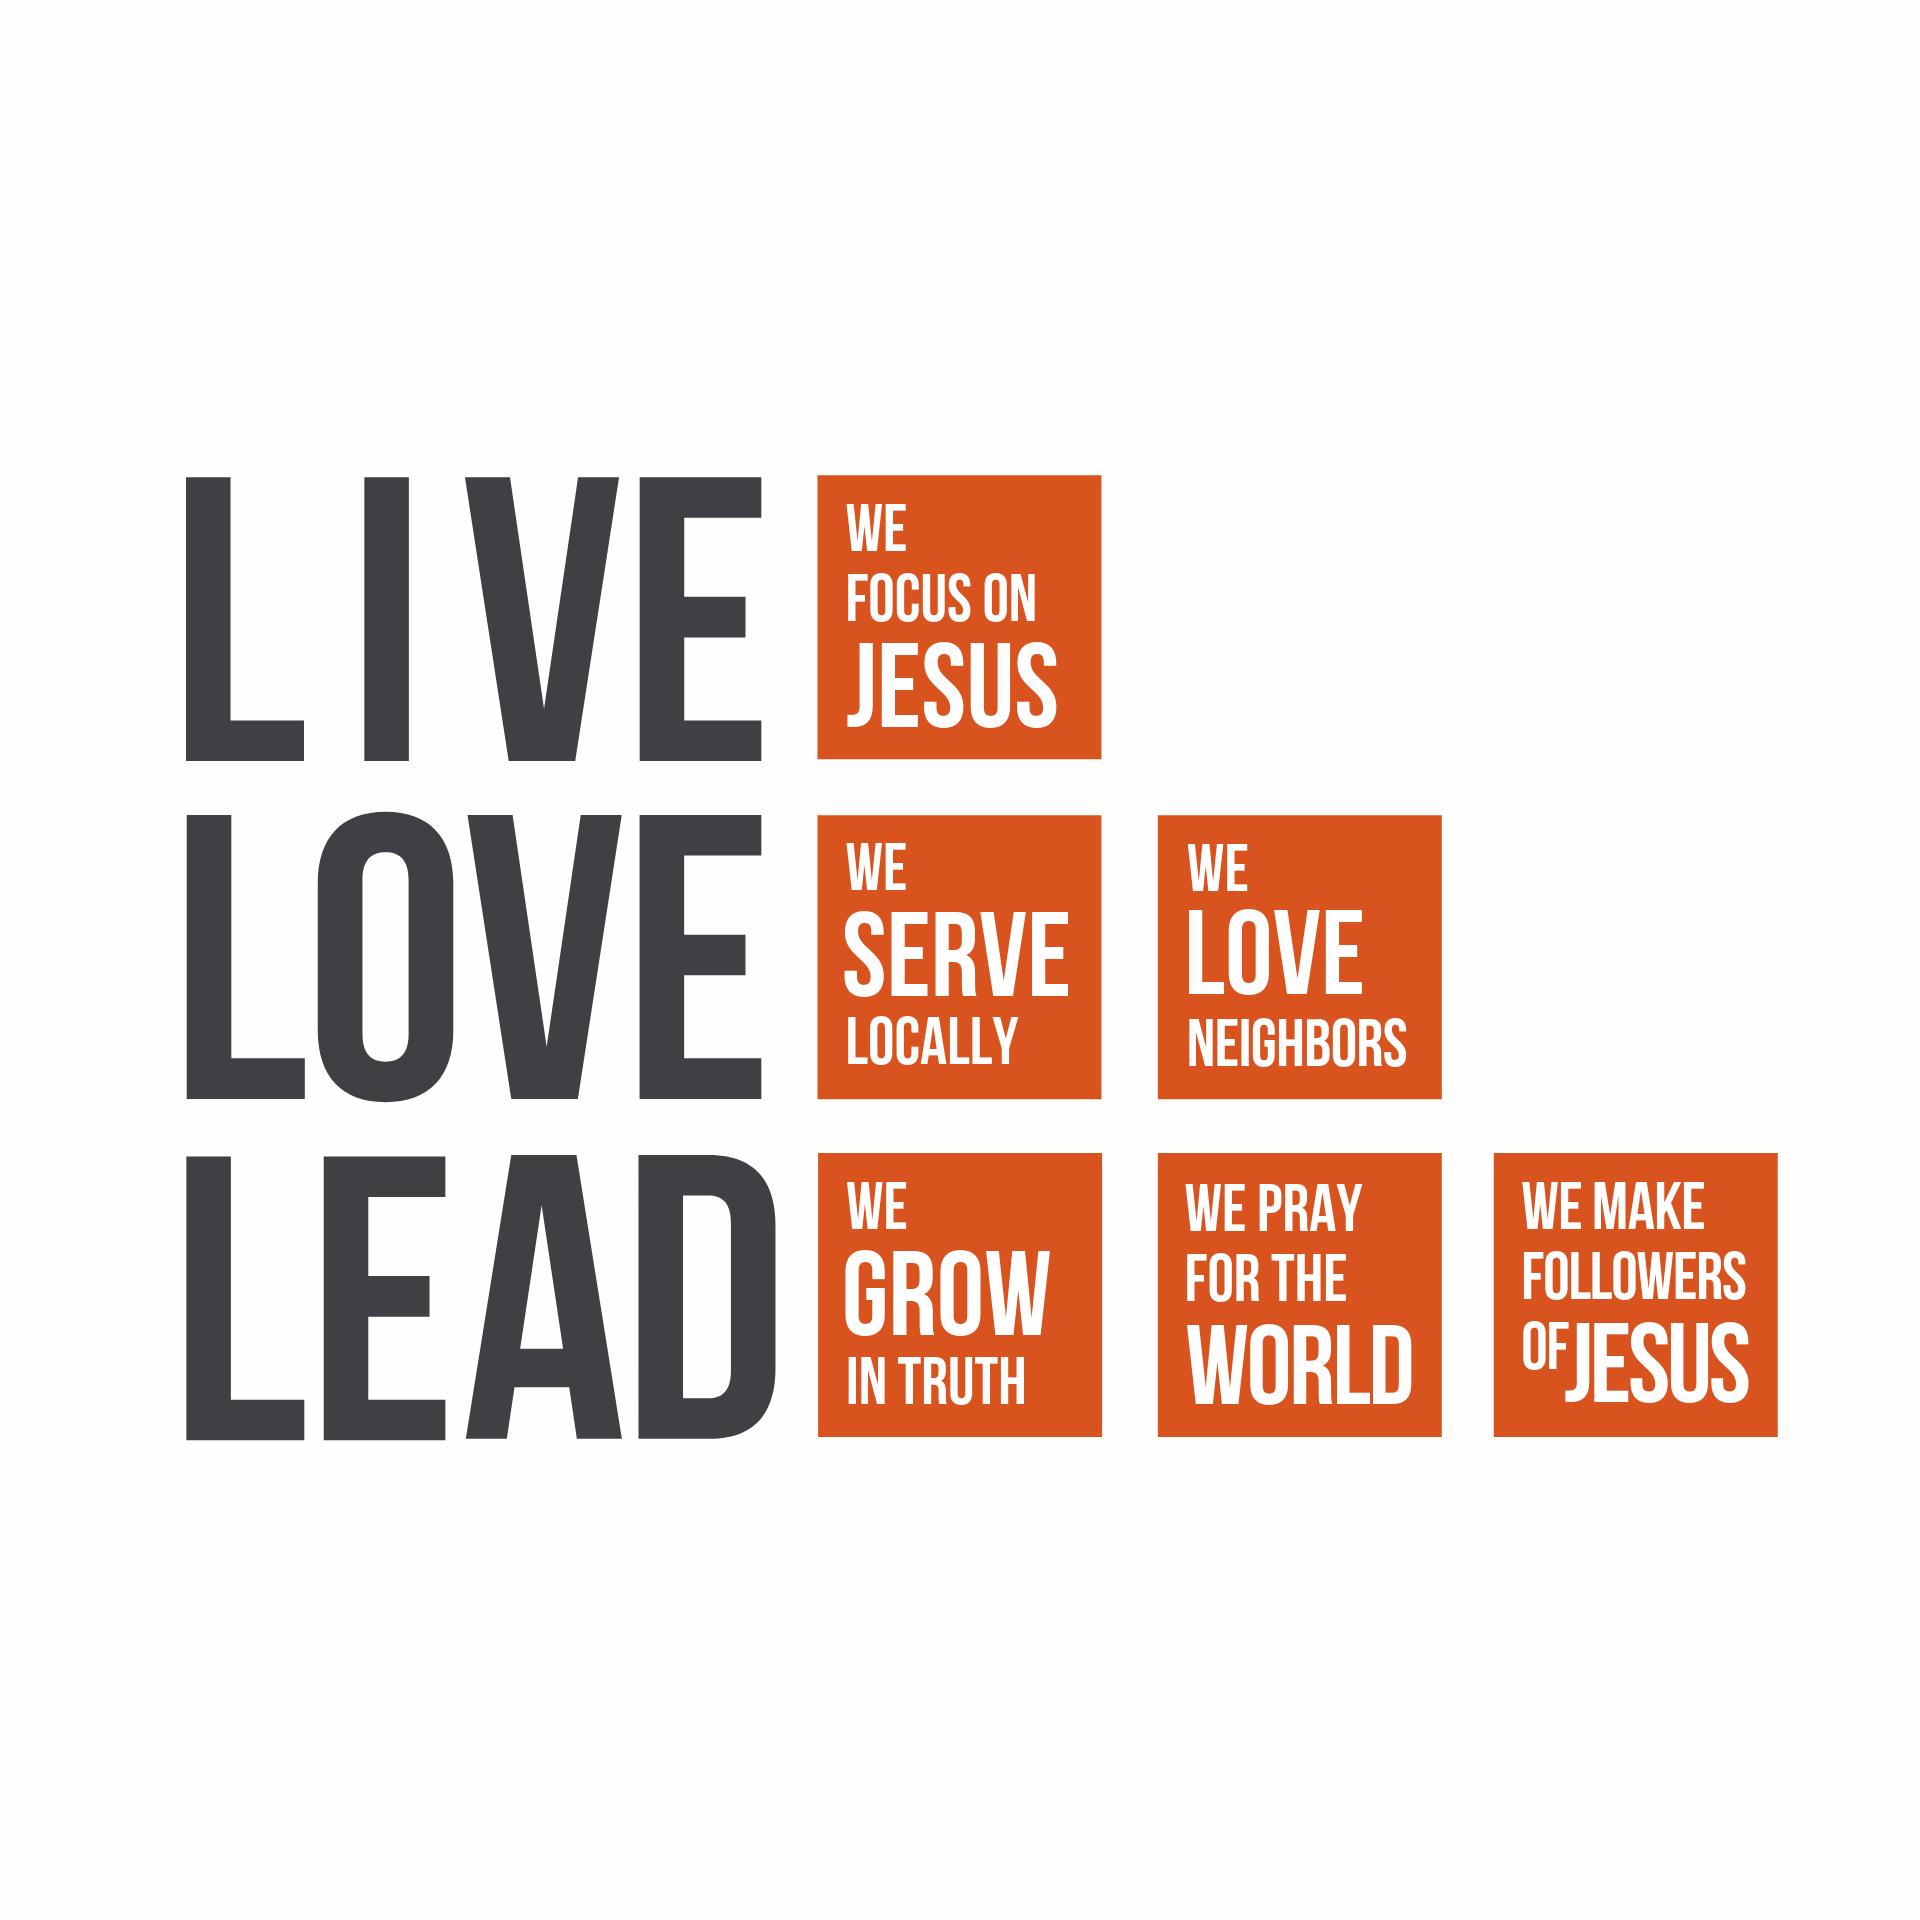 Live love lead